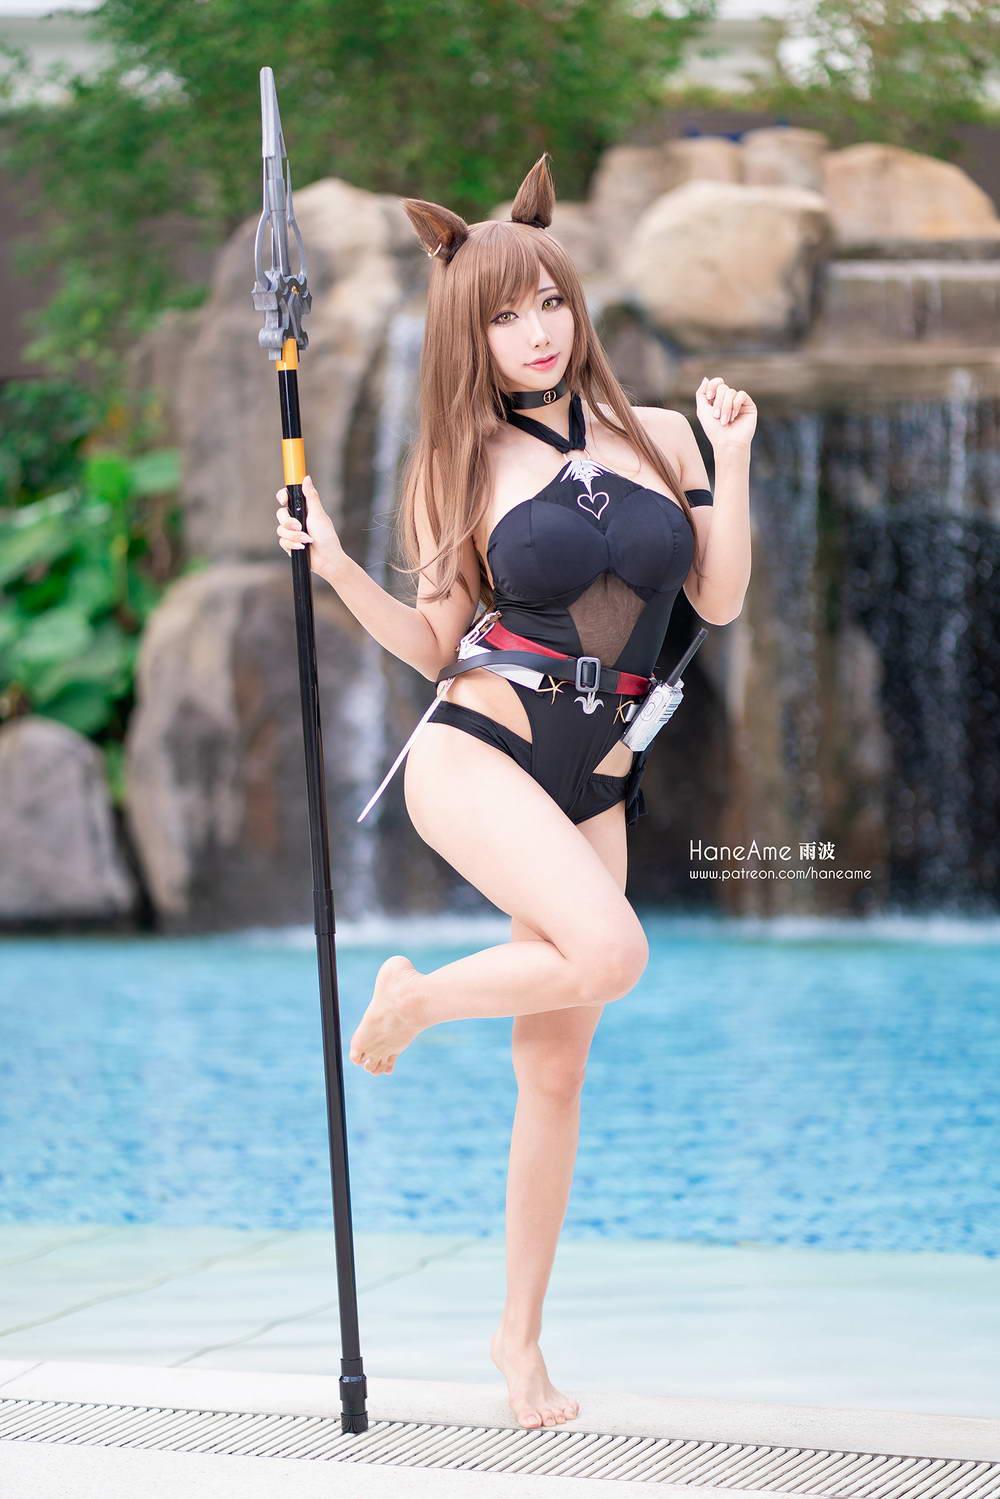 Hane Ame 雨波写真 NO.042 – 天火泳装[/29MB]